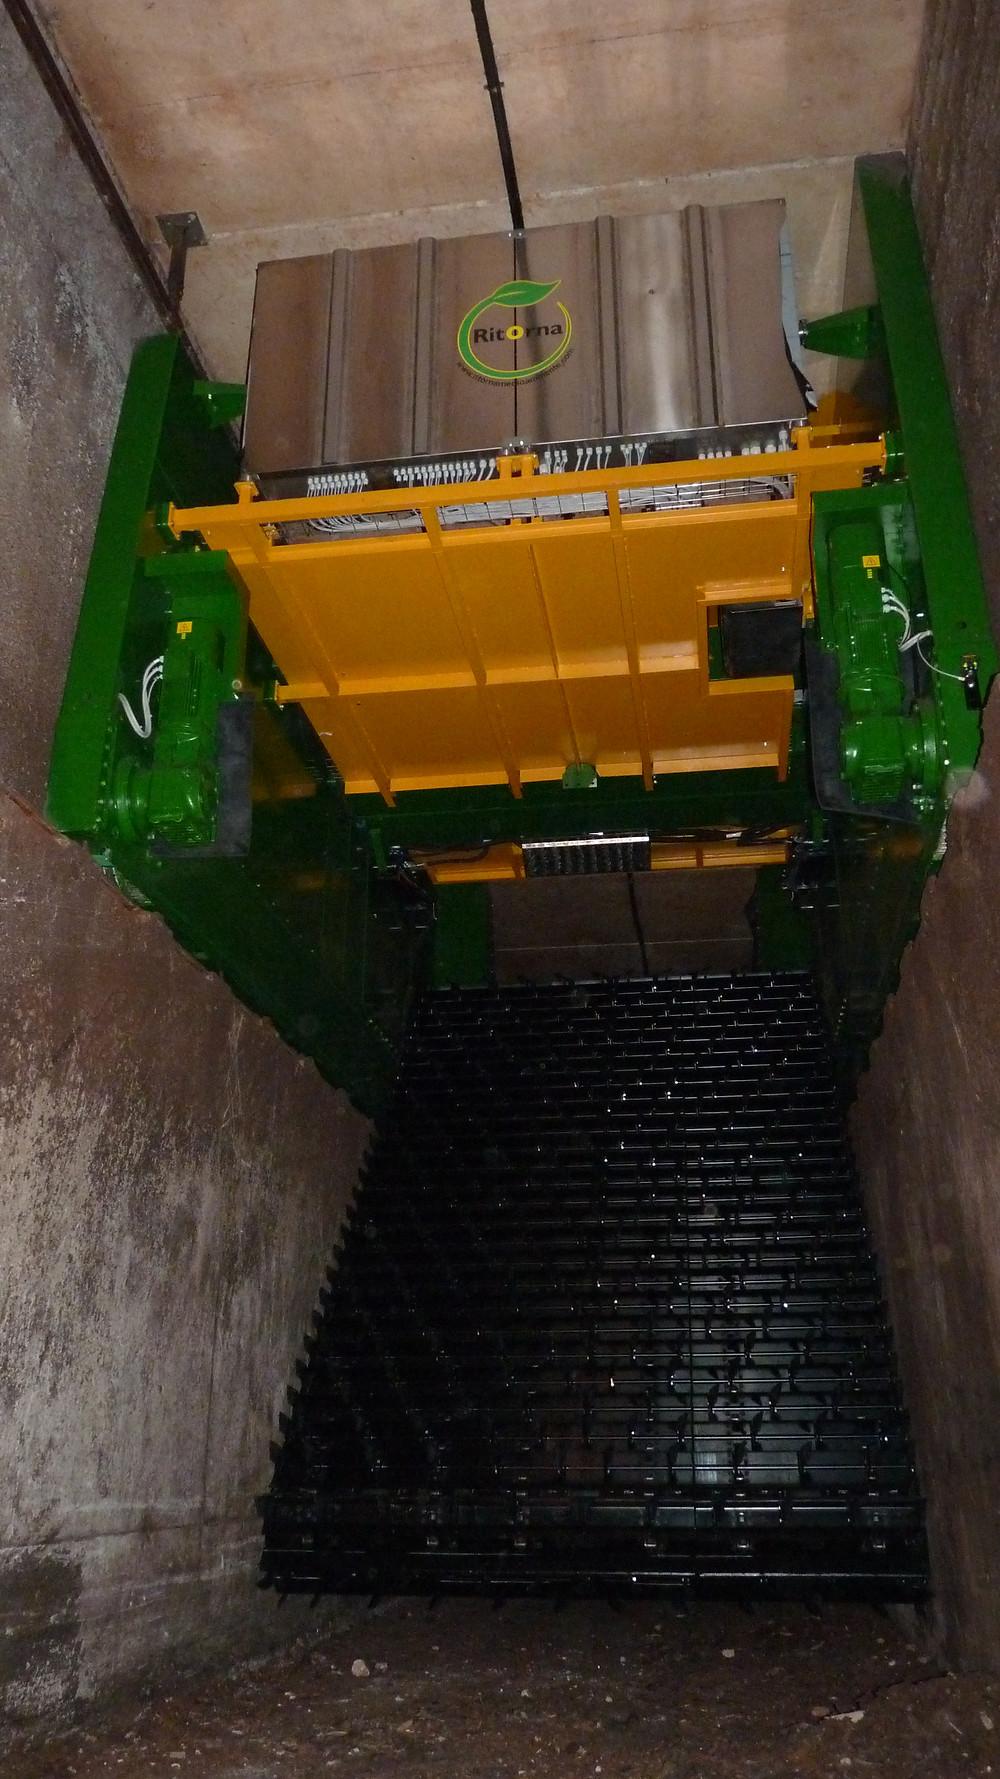 Volteadora Talpa en interior túnel de compostaje